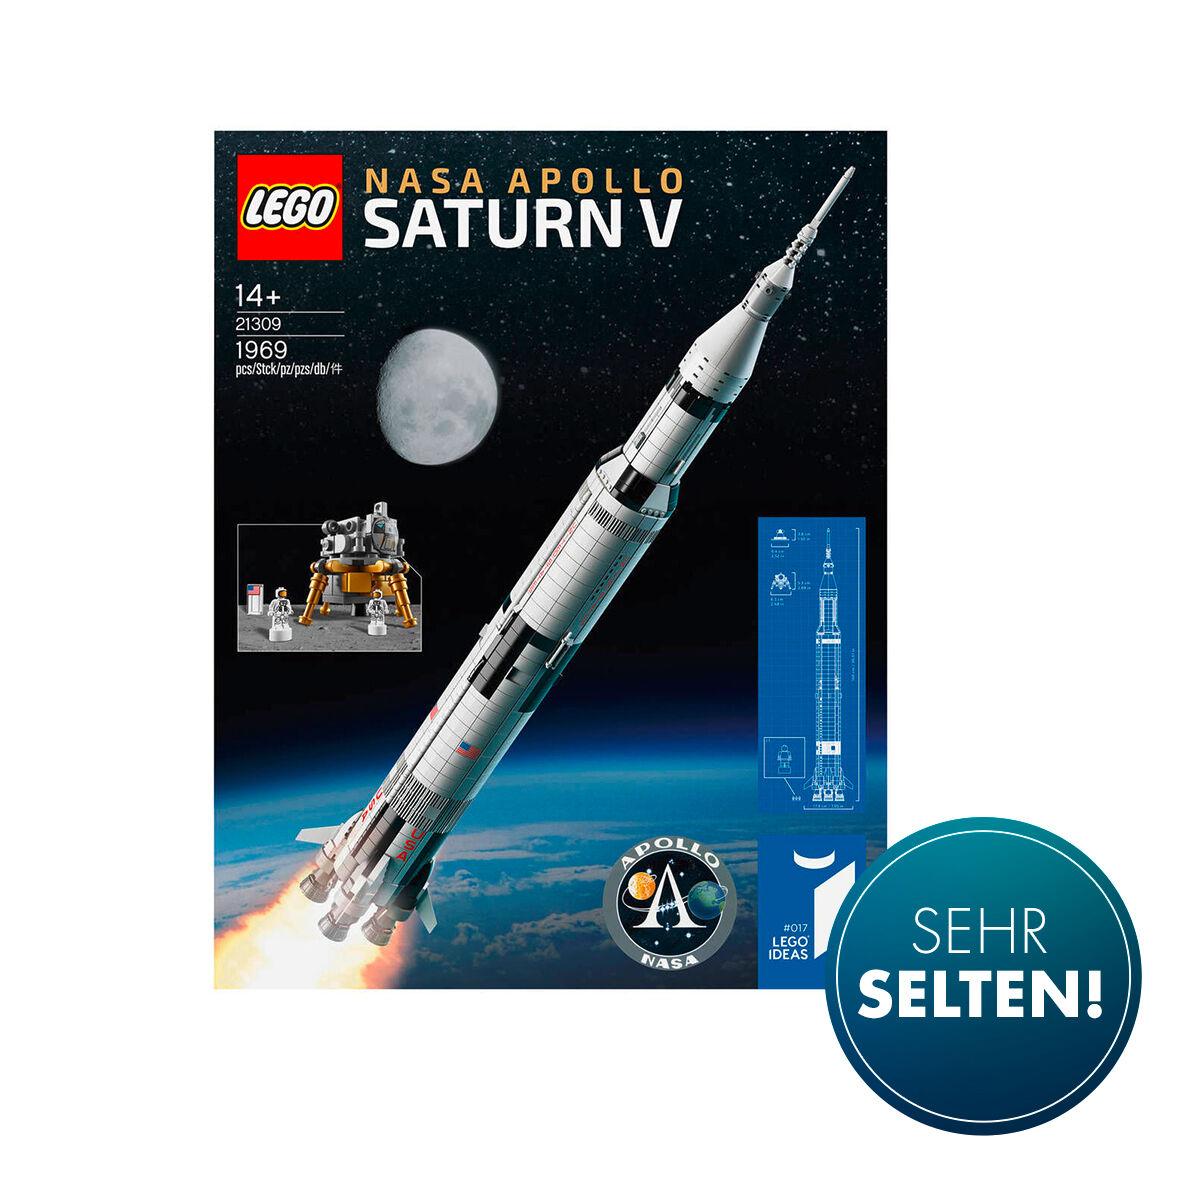 [Galeria Karstadt Kaufhof] Lego 21309 Saturn V